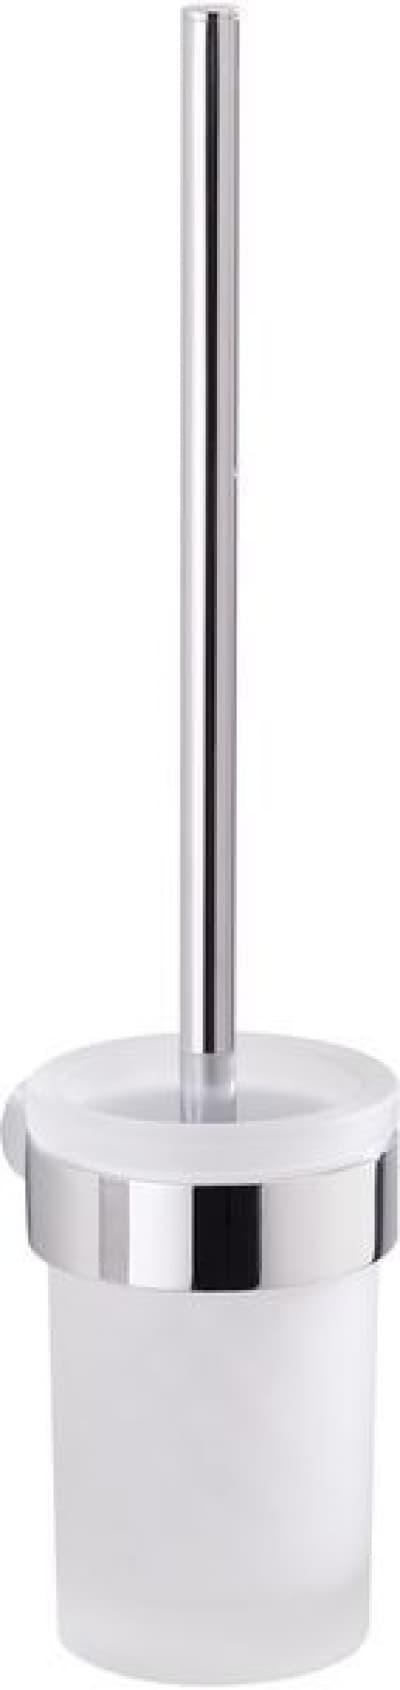 Gedy G-Pirenei, настенный стеклянный ёршик для унитаза, цвет хром PI33-03(13)